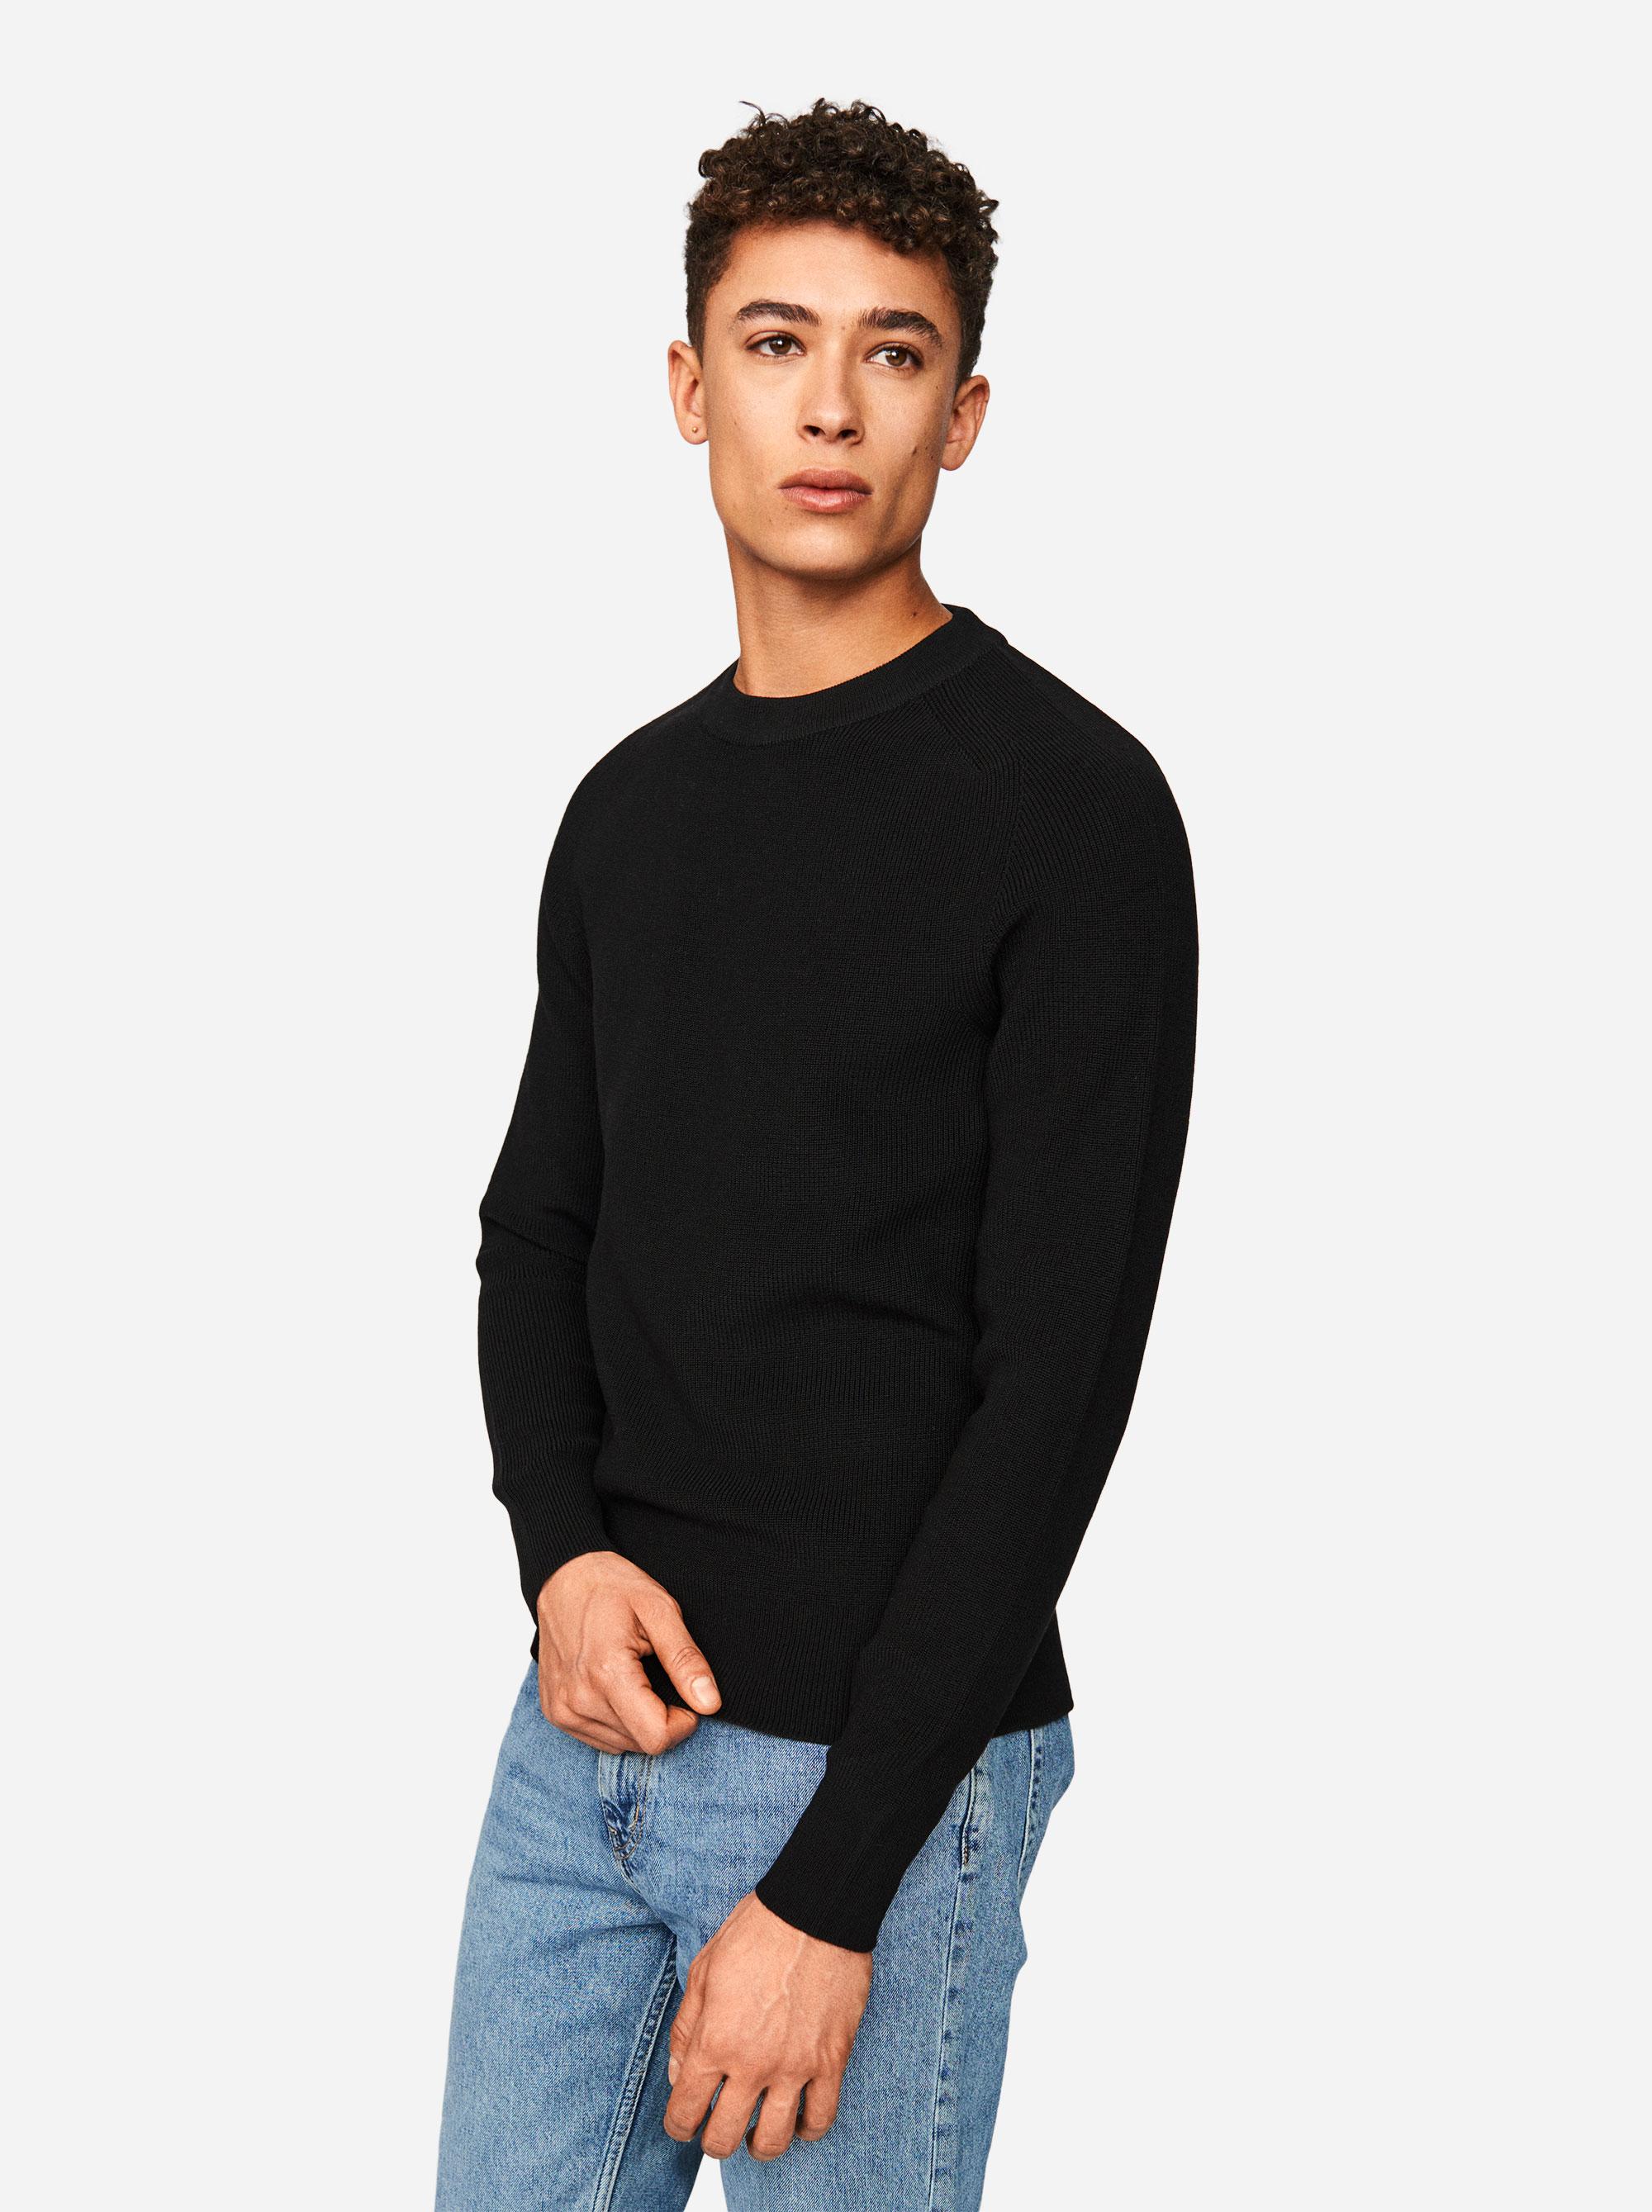 Teym - The Merino Sweater - Men - Black - 1